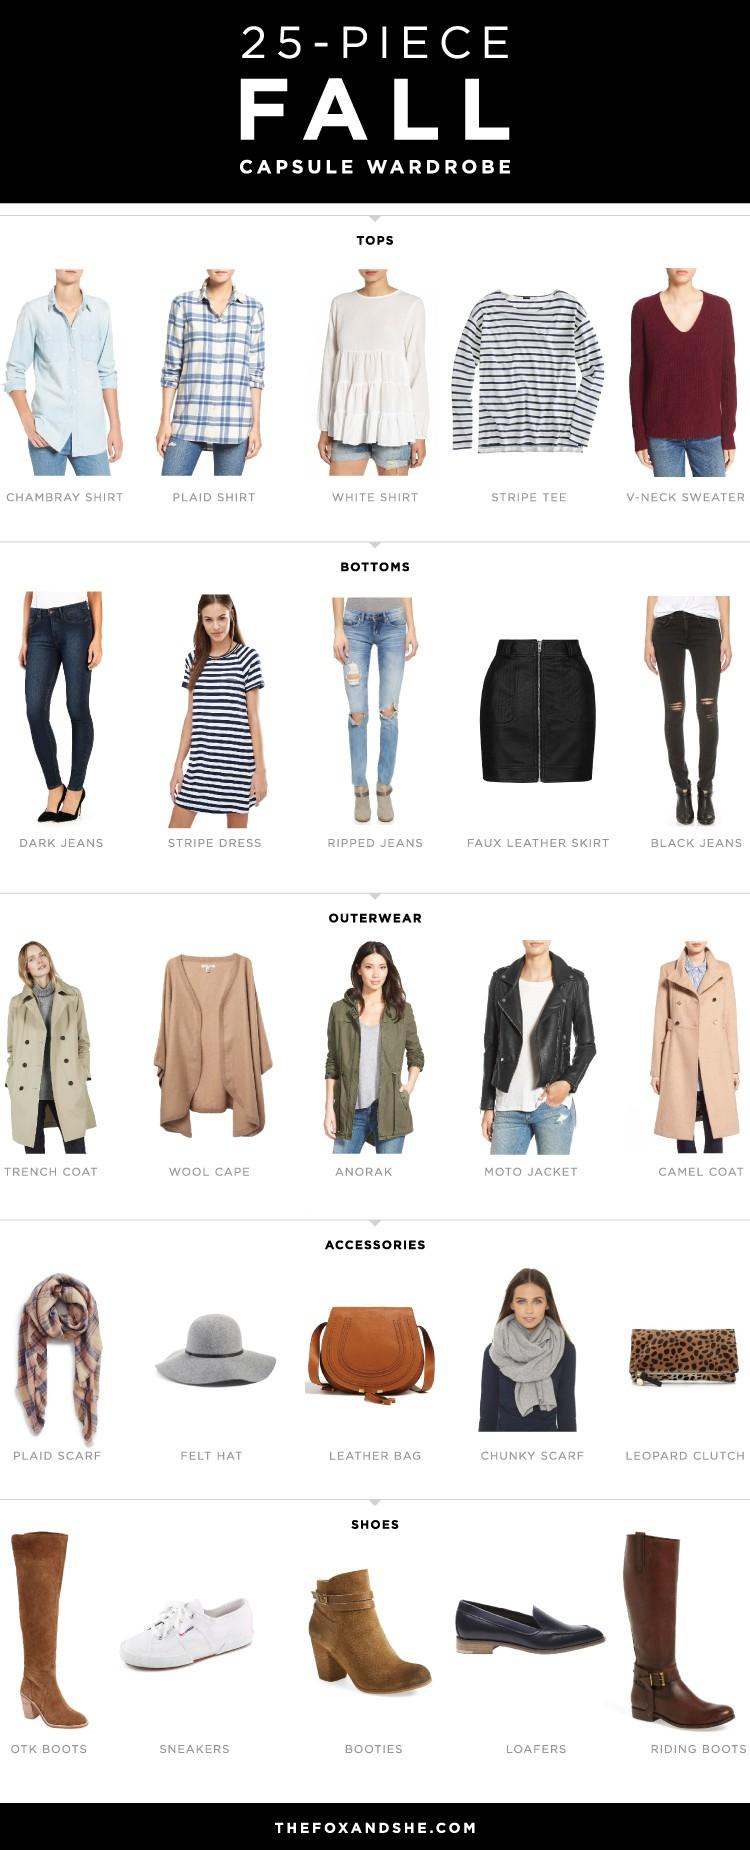 3a3534b9aad1e How to Create a Fall Capsule Wardrobe